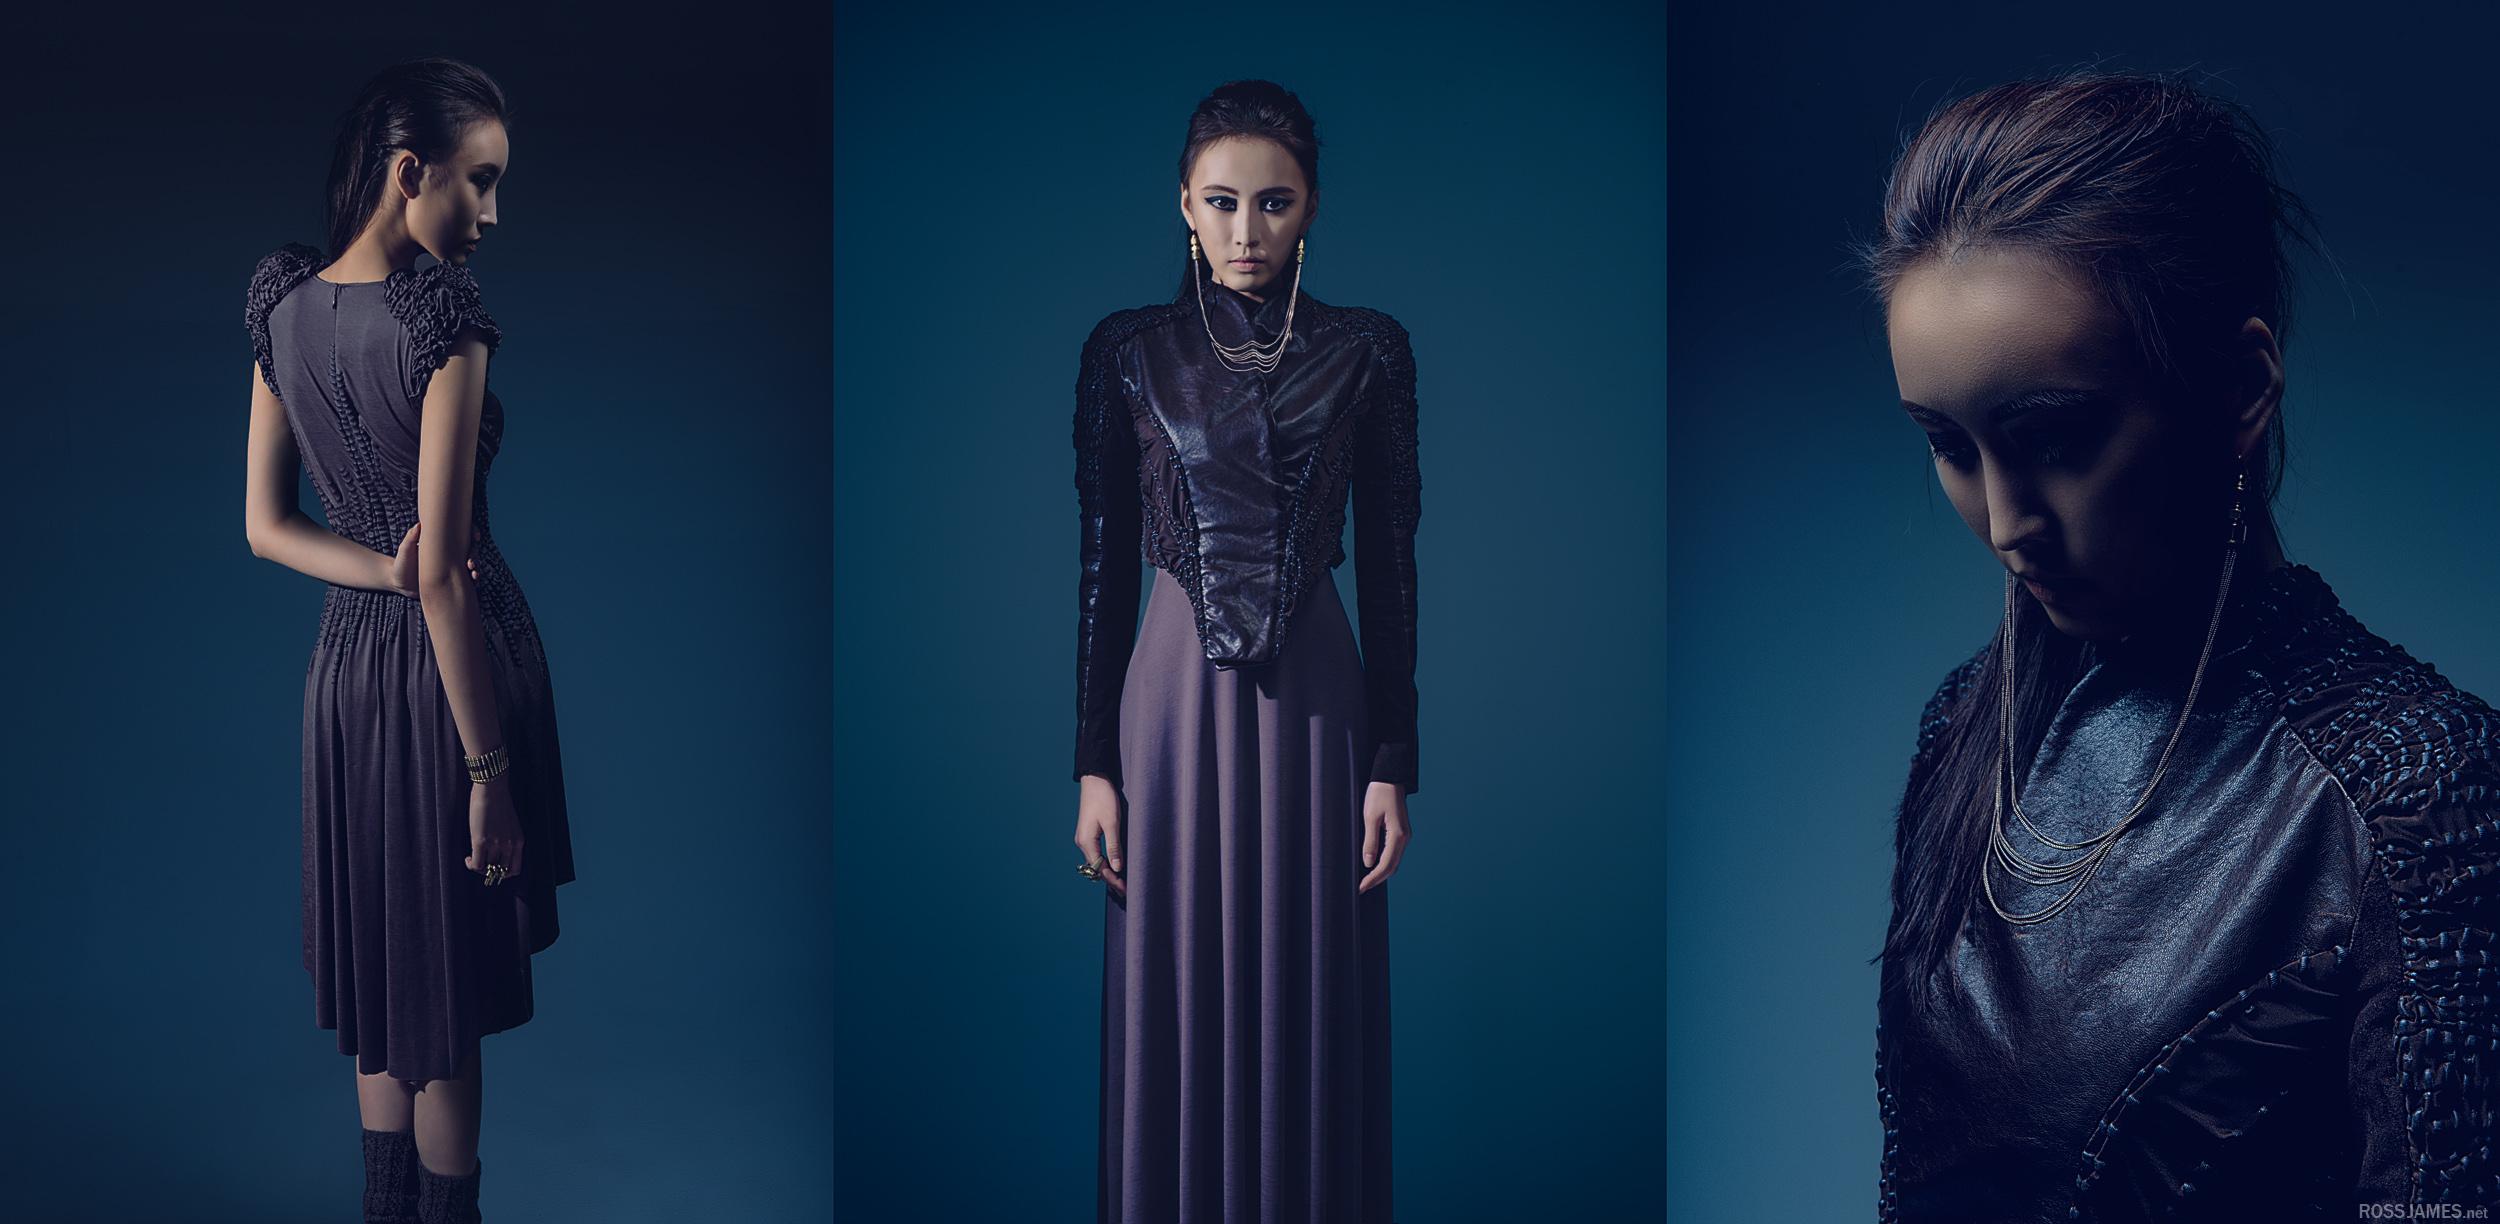 Clothing designer: Sarah Kim; Model: 강민희